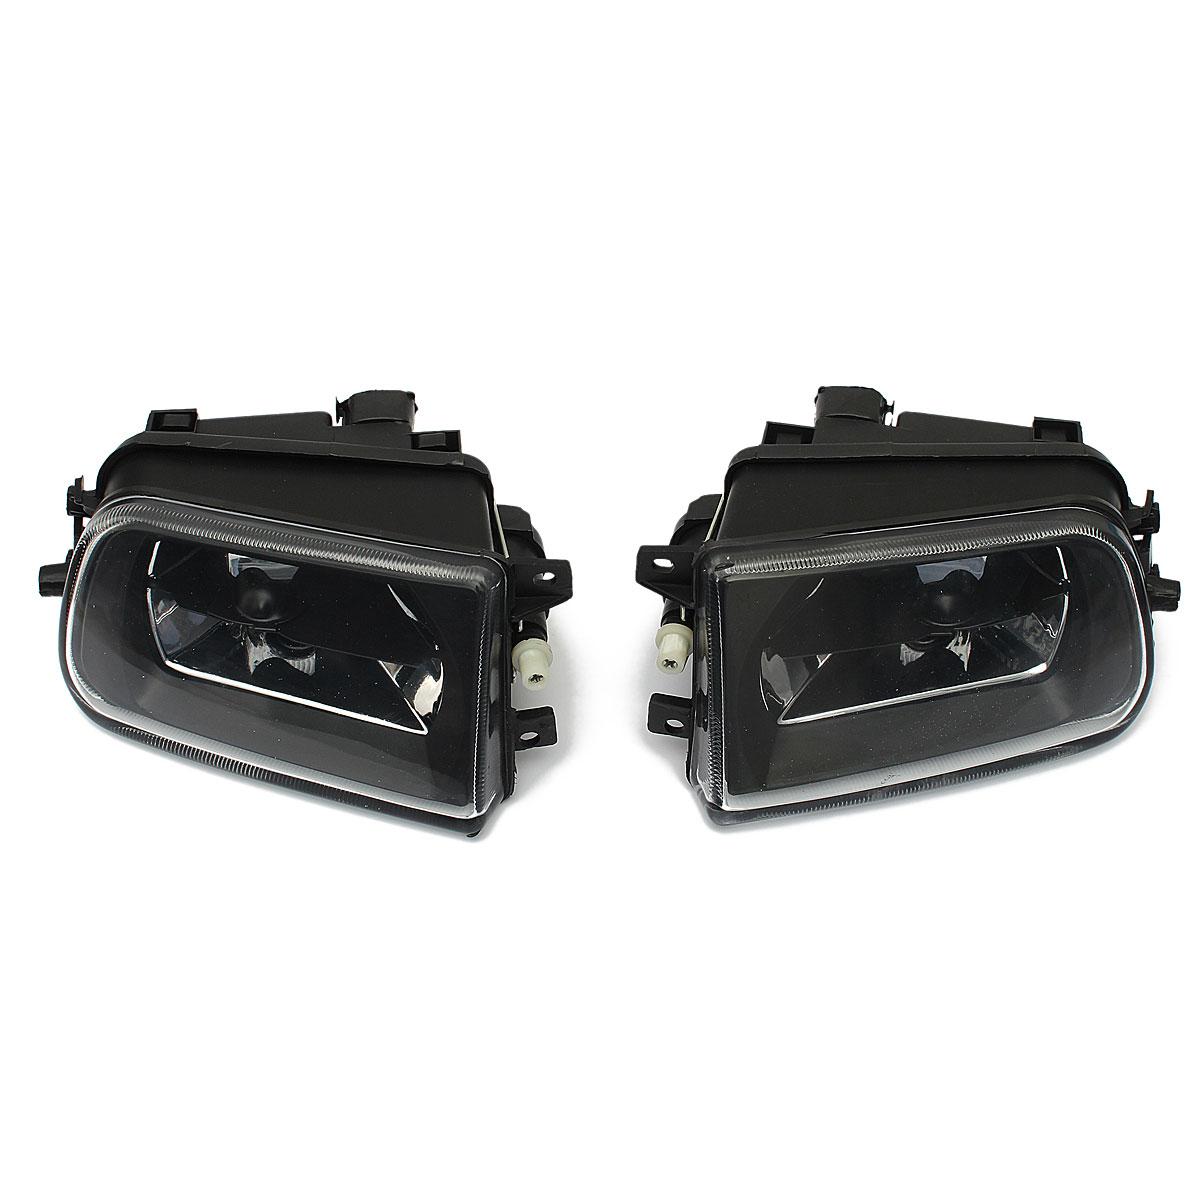 Audew 1 Pair Car Fog Lights Driving Spot Lamps Black Housing For BMW E39 5 SERIES Z3 1997-2000<br><br>Aliexpress